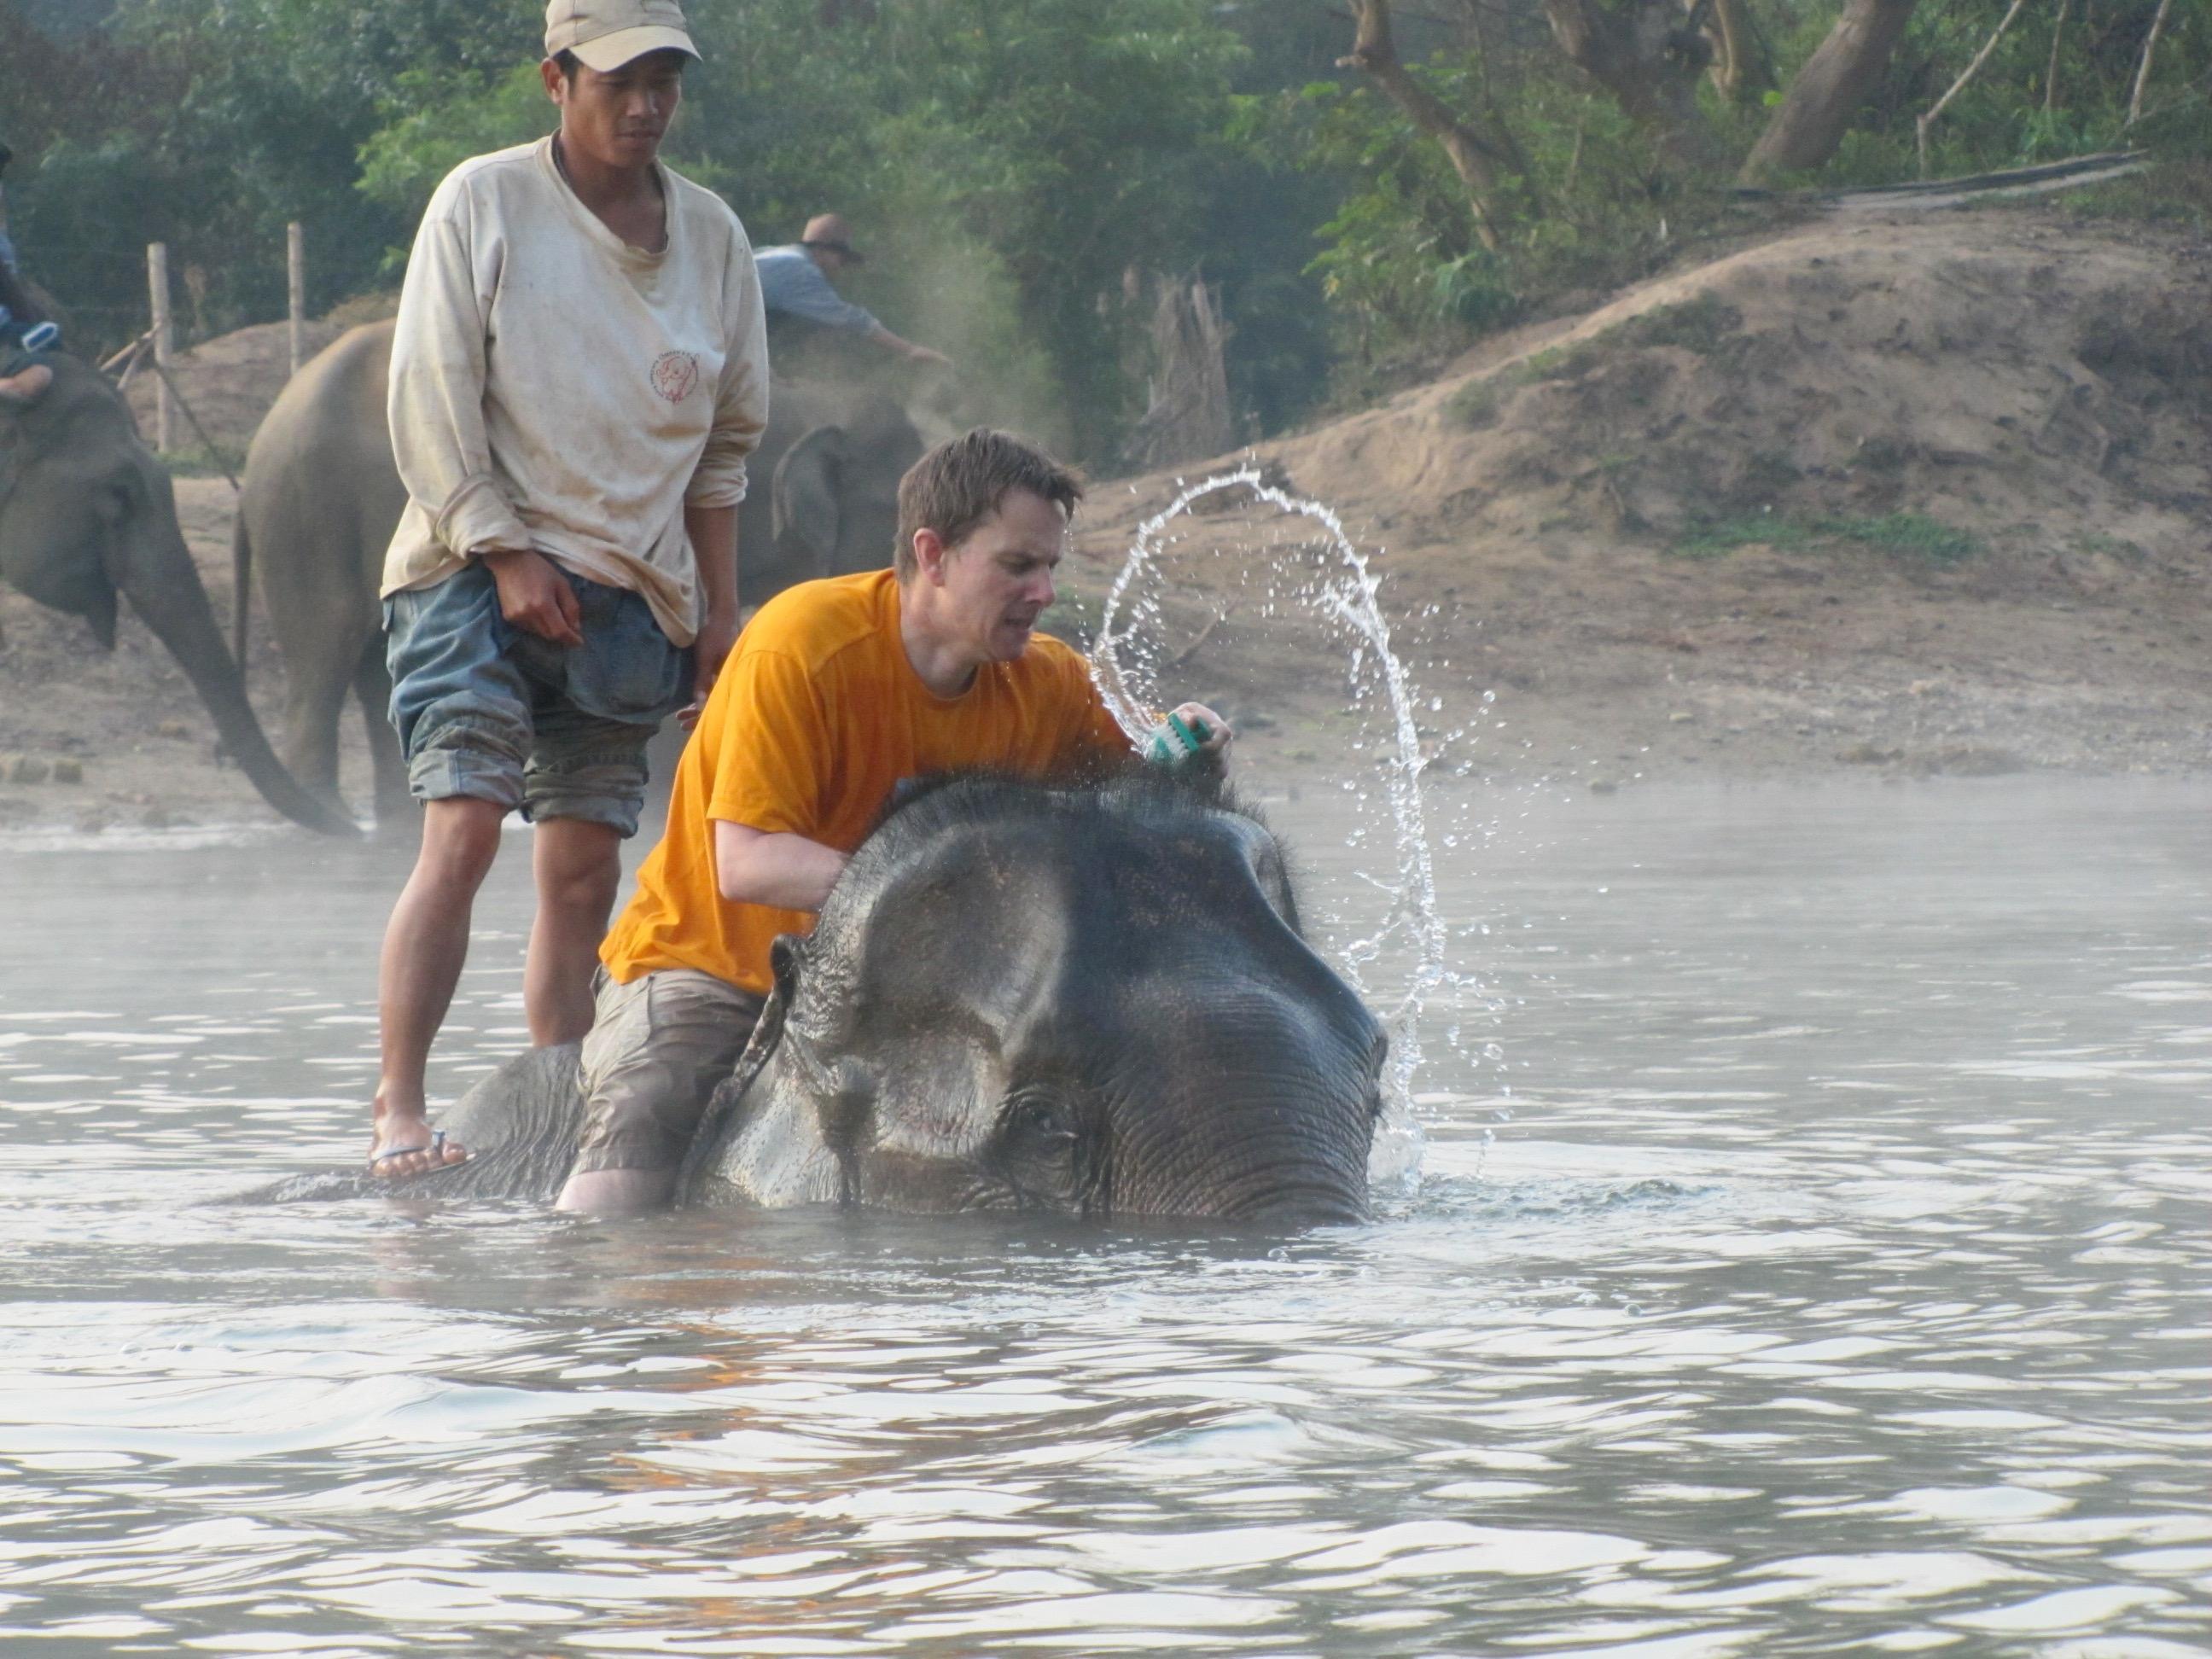 Elephant, Elephant Village, Luang Prabang, Laos